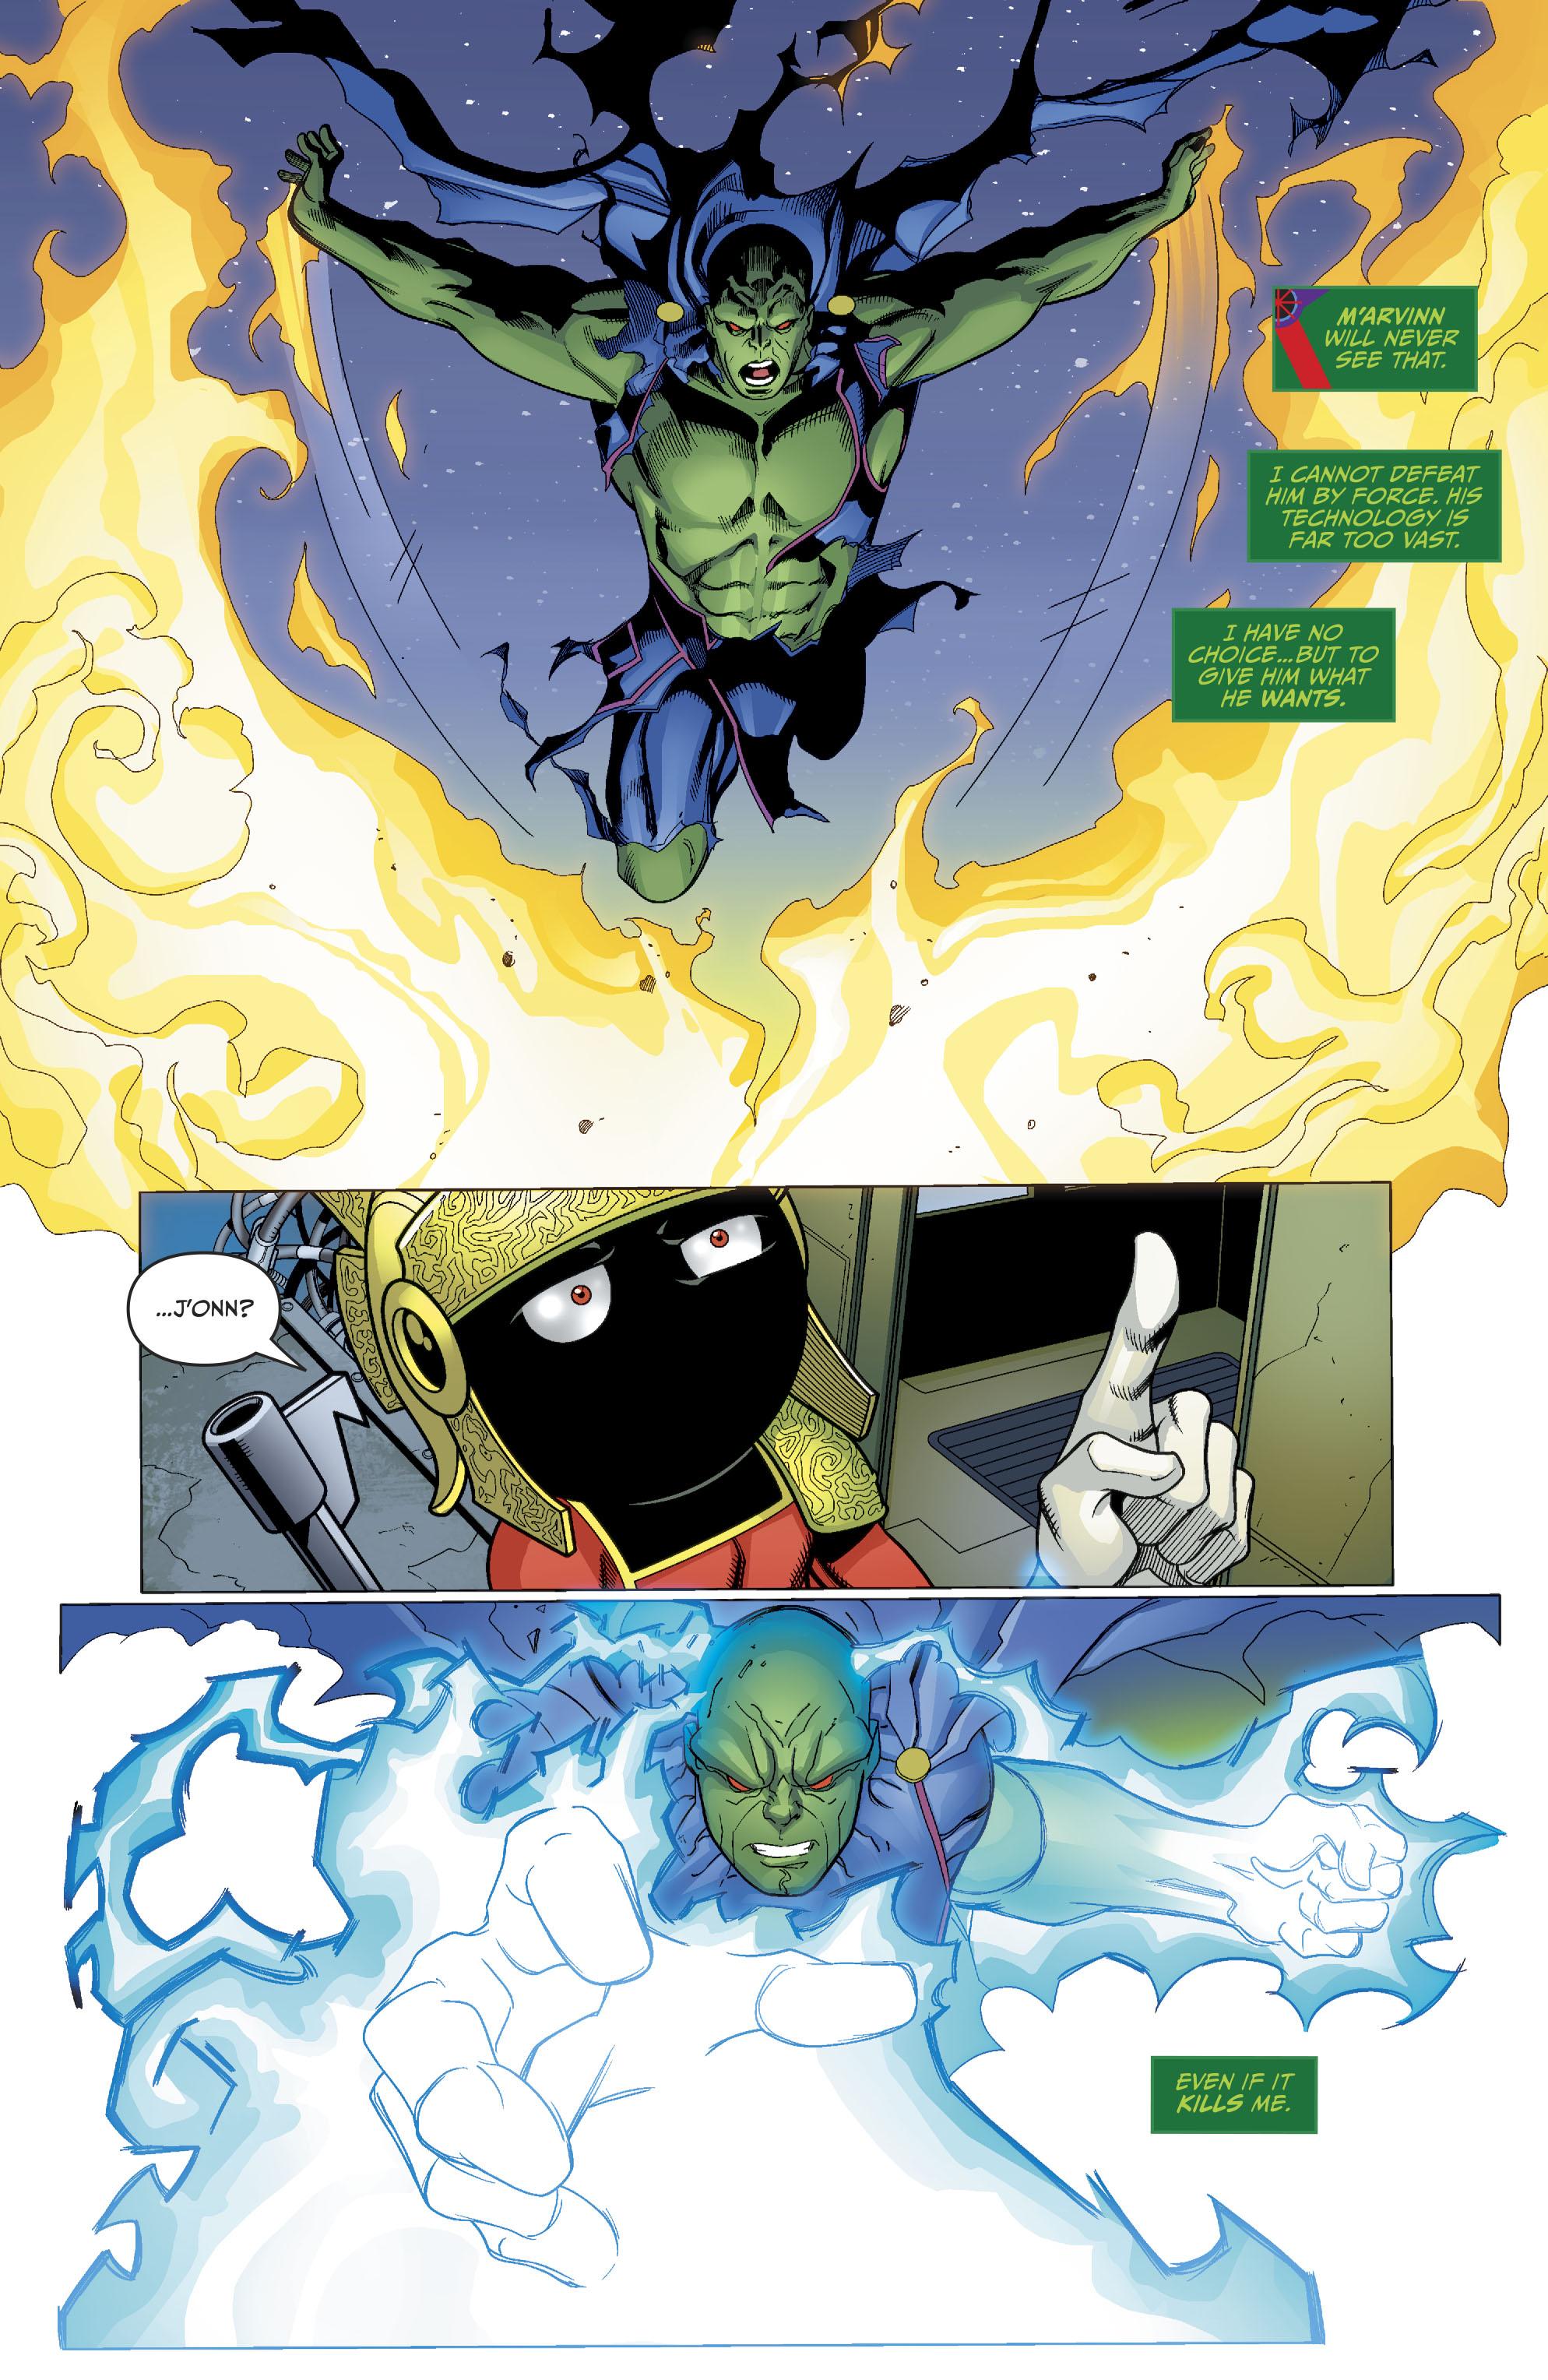 Read online Martian Manhunter/Marvin the Martian Special comic -  Issue # Full - 29